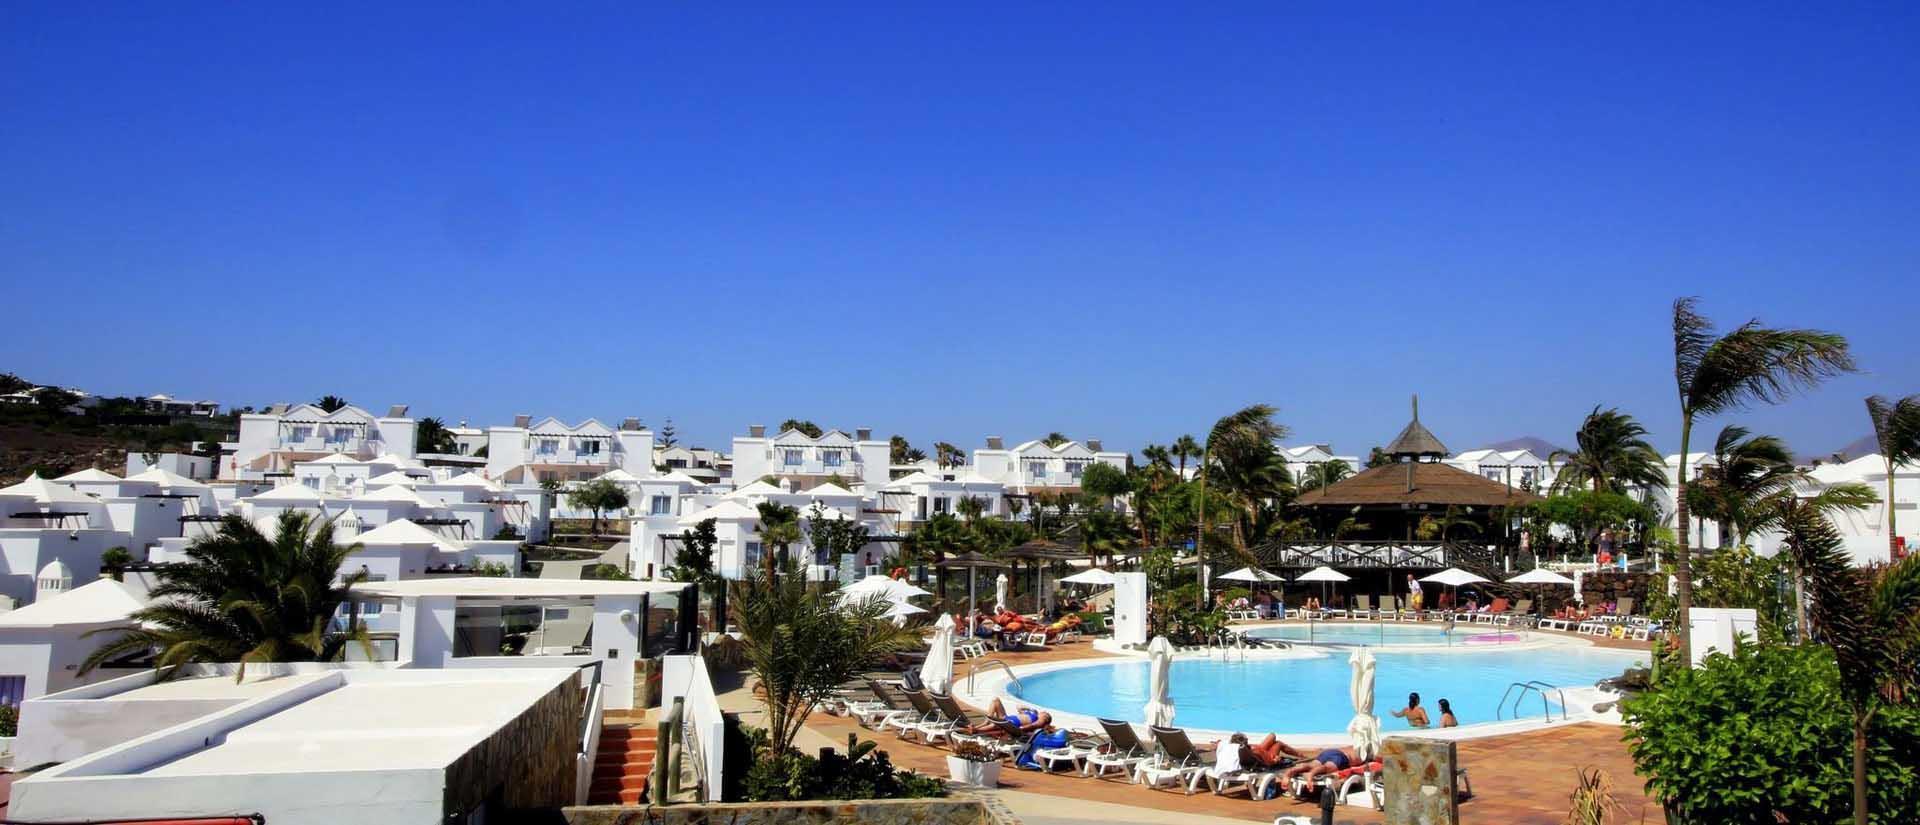 View Of Pool Area And Surroundings At Labranda Alyssa Suite Hote